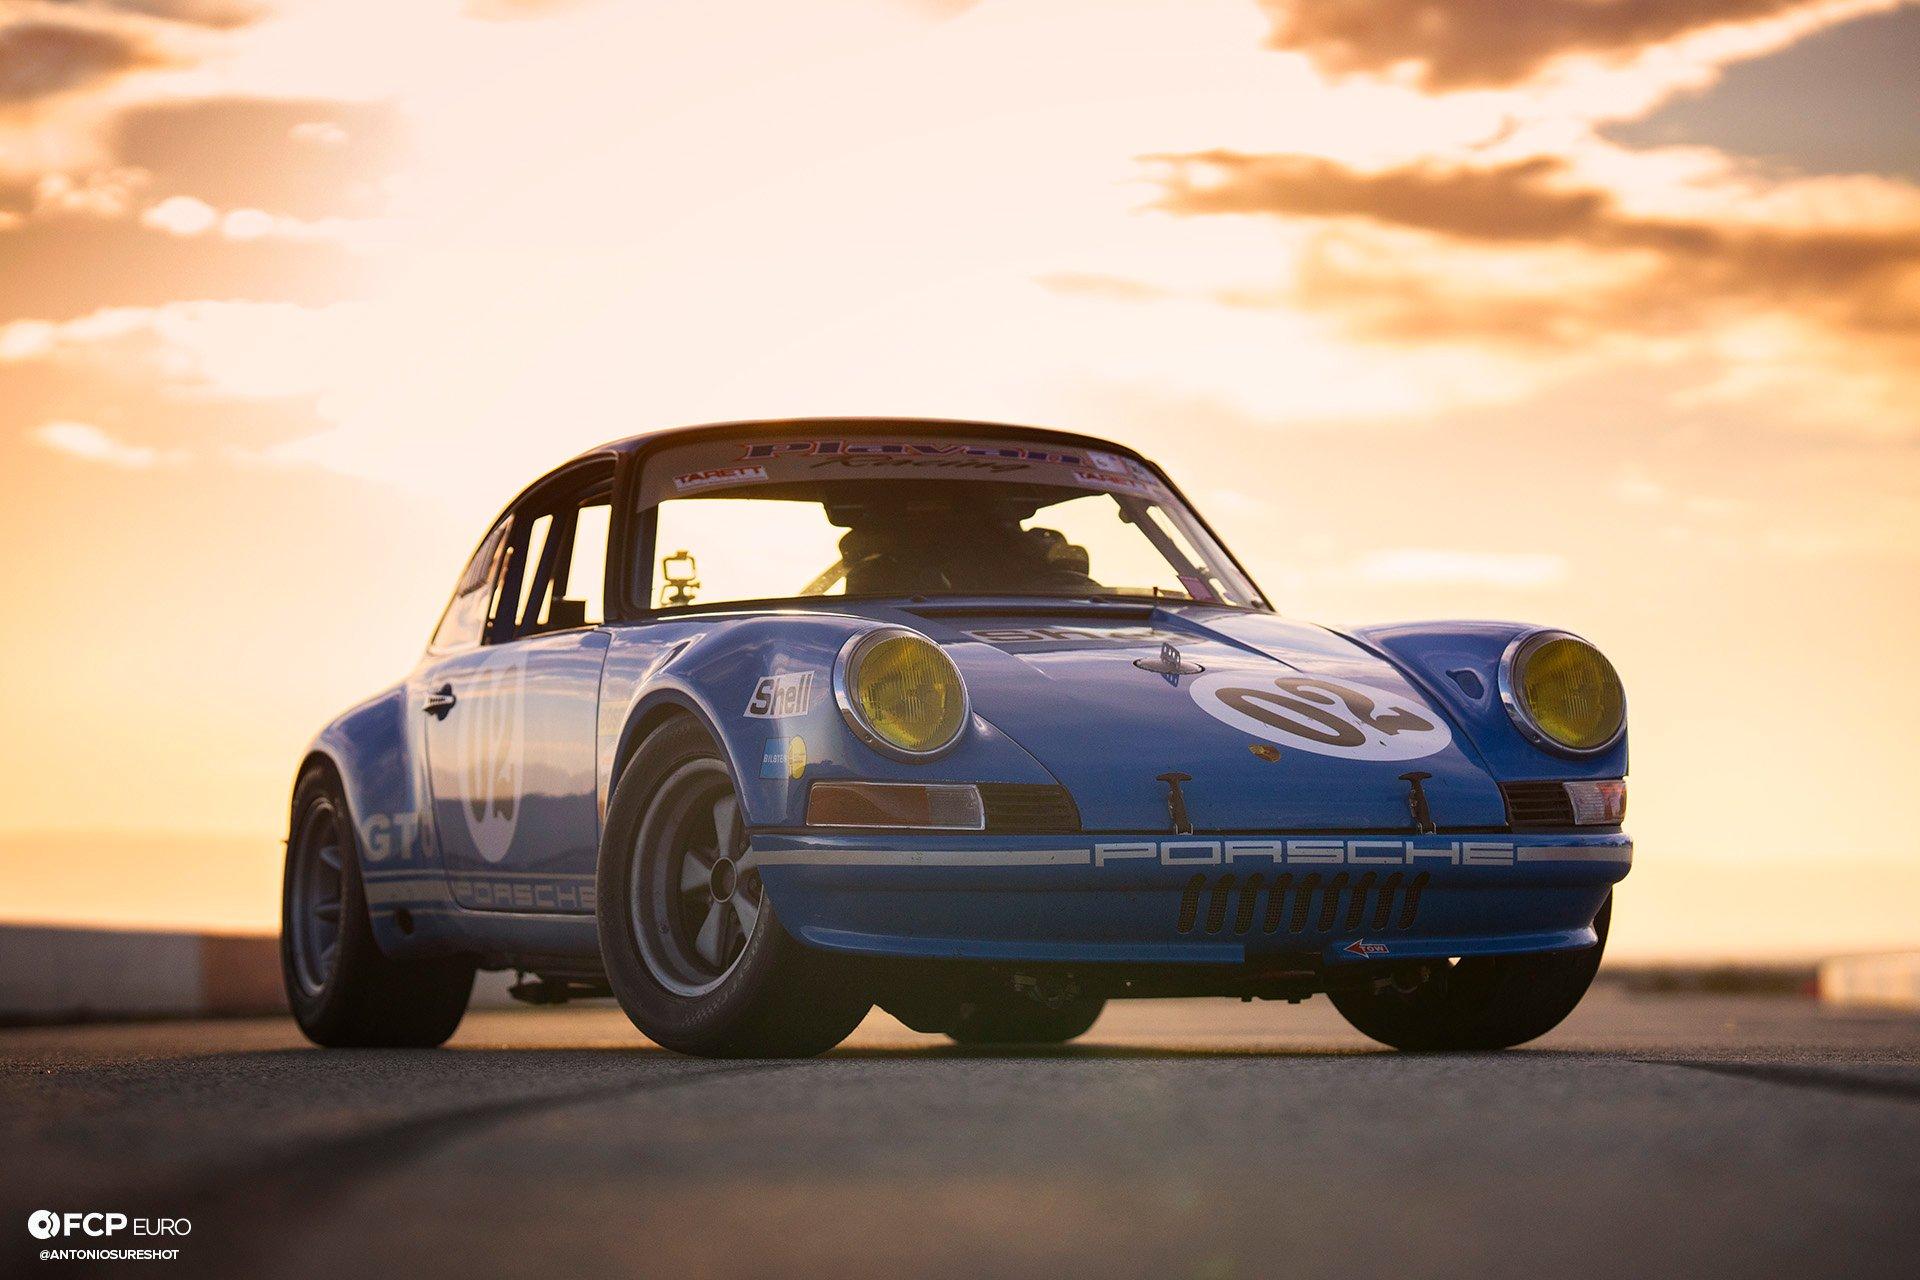 Porsche 911 Longnose VARA EOSR9396 crop